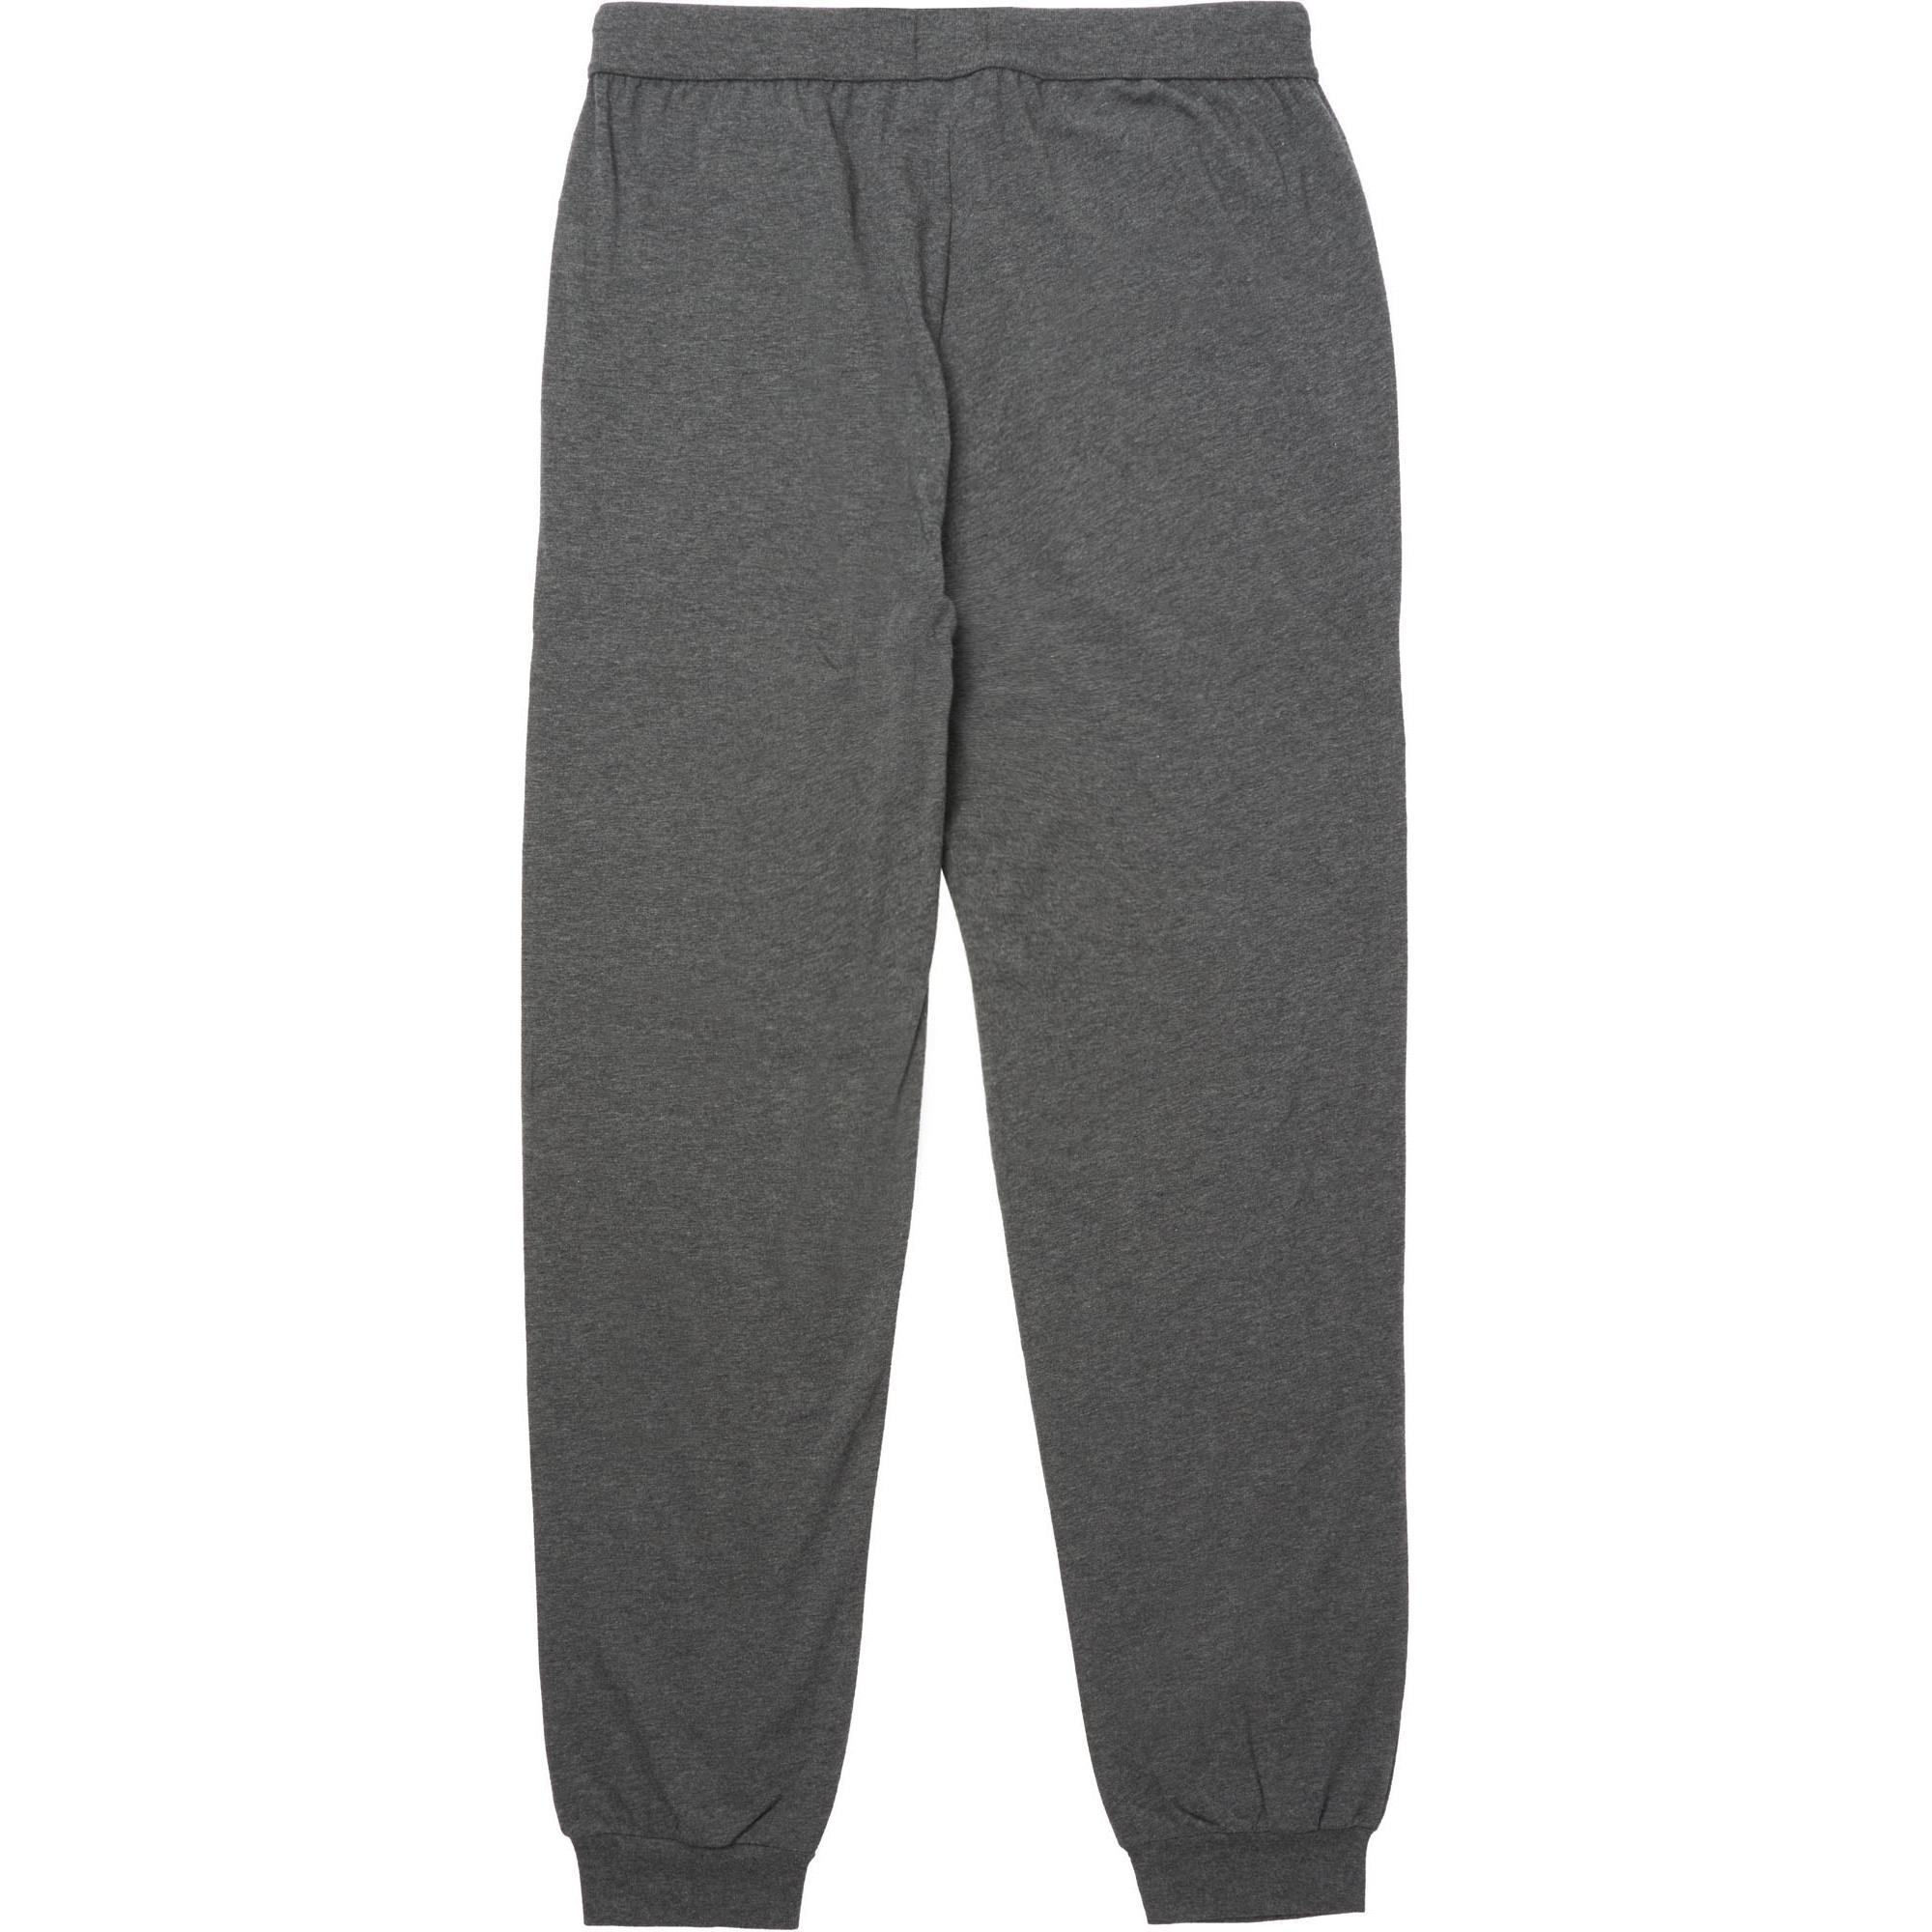 819bbbc89 ... BOSS - Gray Mix & Match Track Pants - Medium Grey for Men - Lyst. Visit  Stuarts London. Tap to visit site